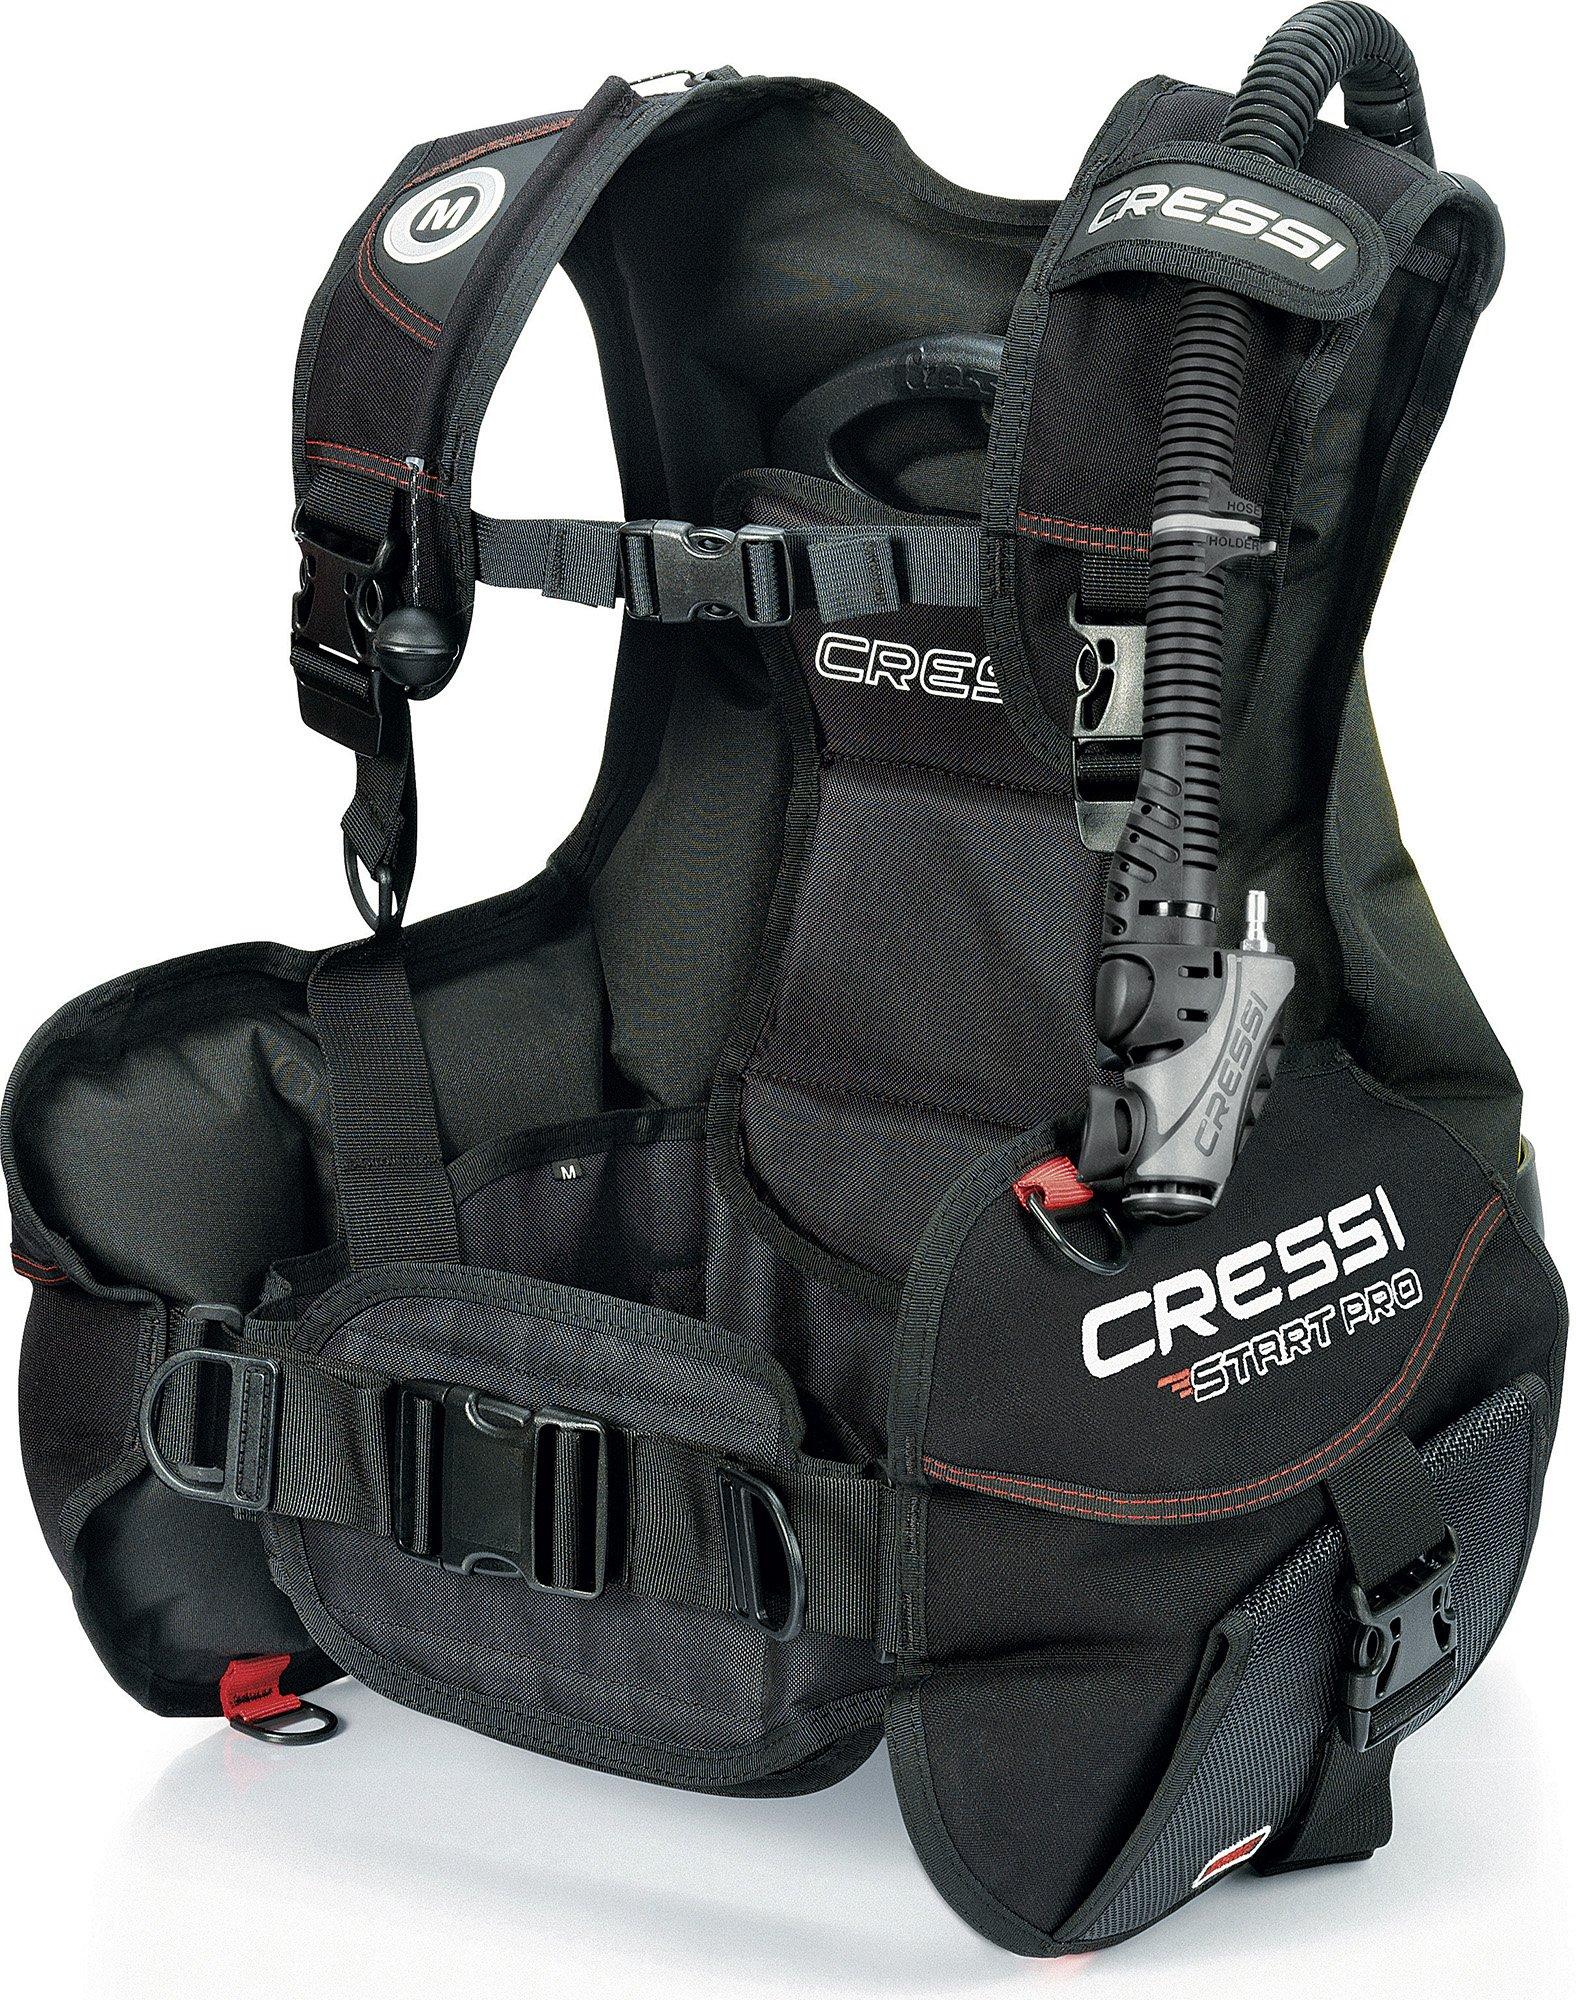 Cressi Start Pro 2.0, Black/red, M